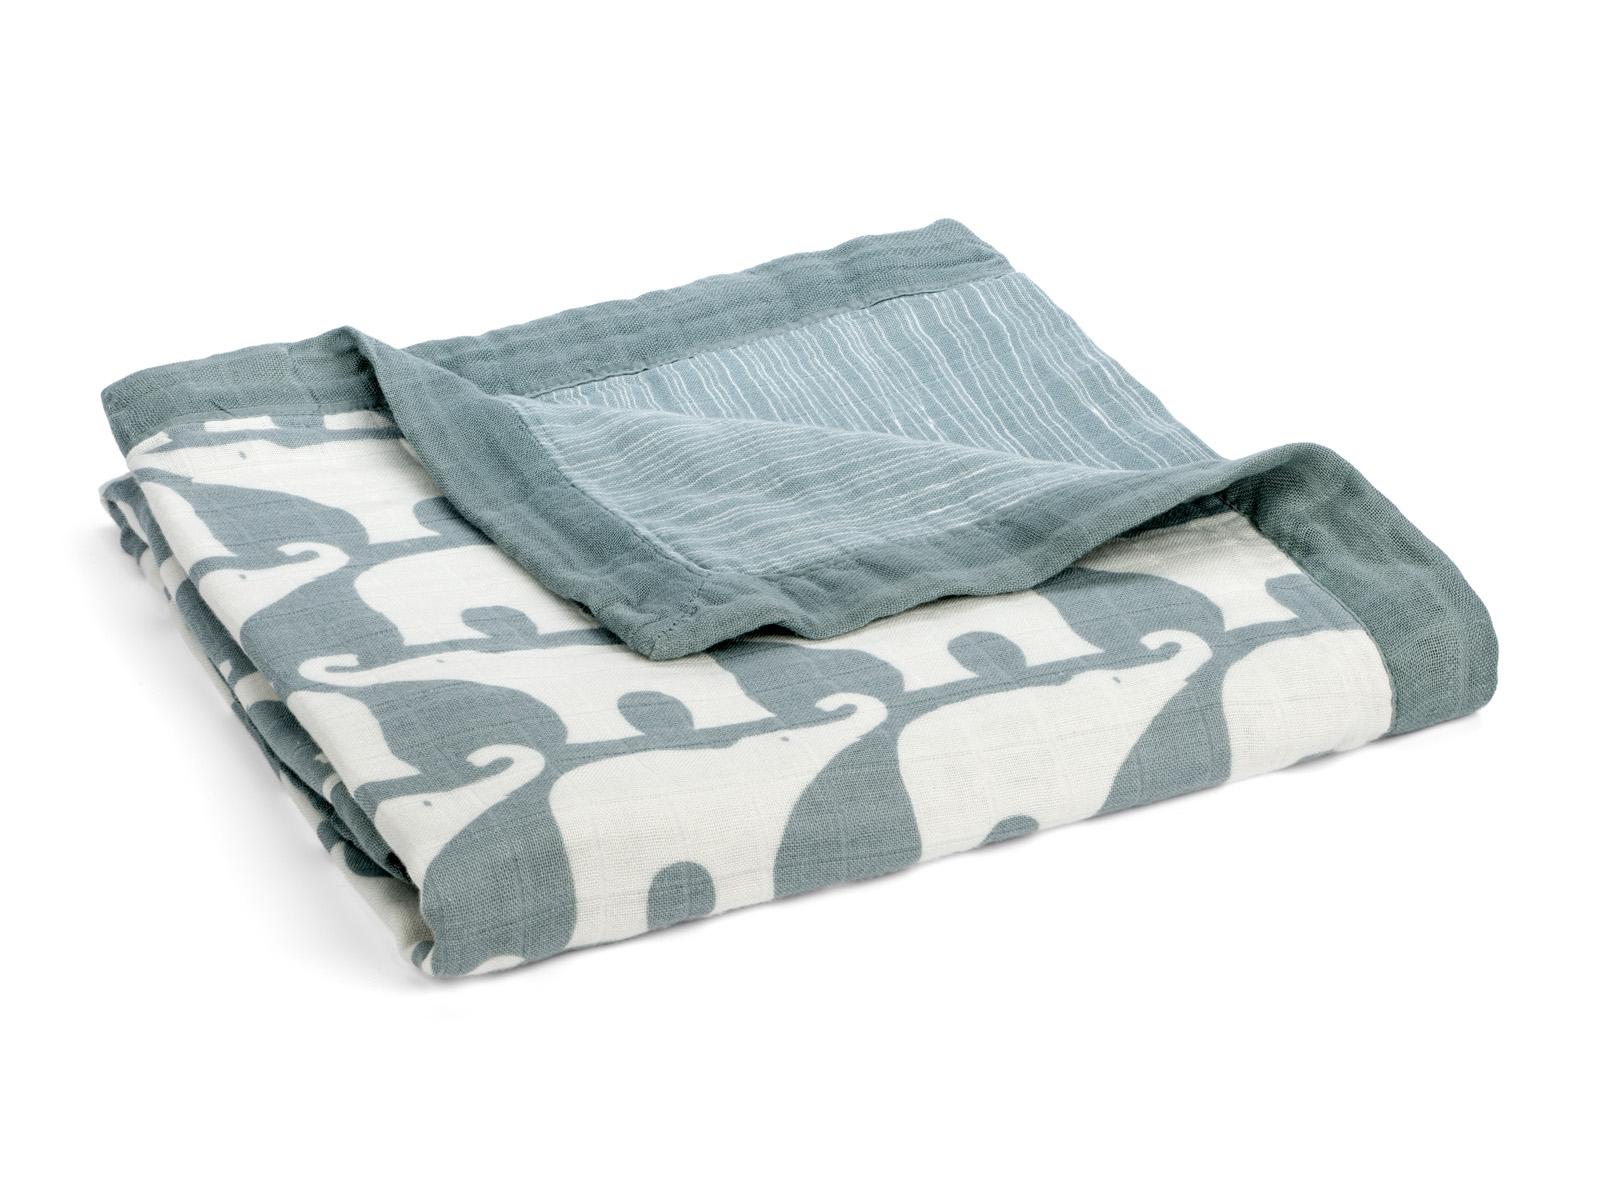 milkbarn big lovey baby kuscheldecke babydecke 90 x 90 cm elefant blau. Black Bedroom Furniture Sets. Home Design Ideas